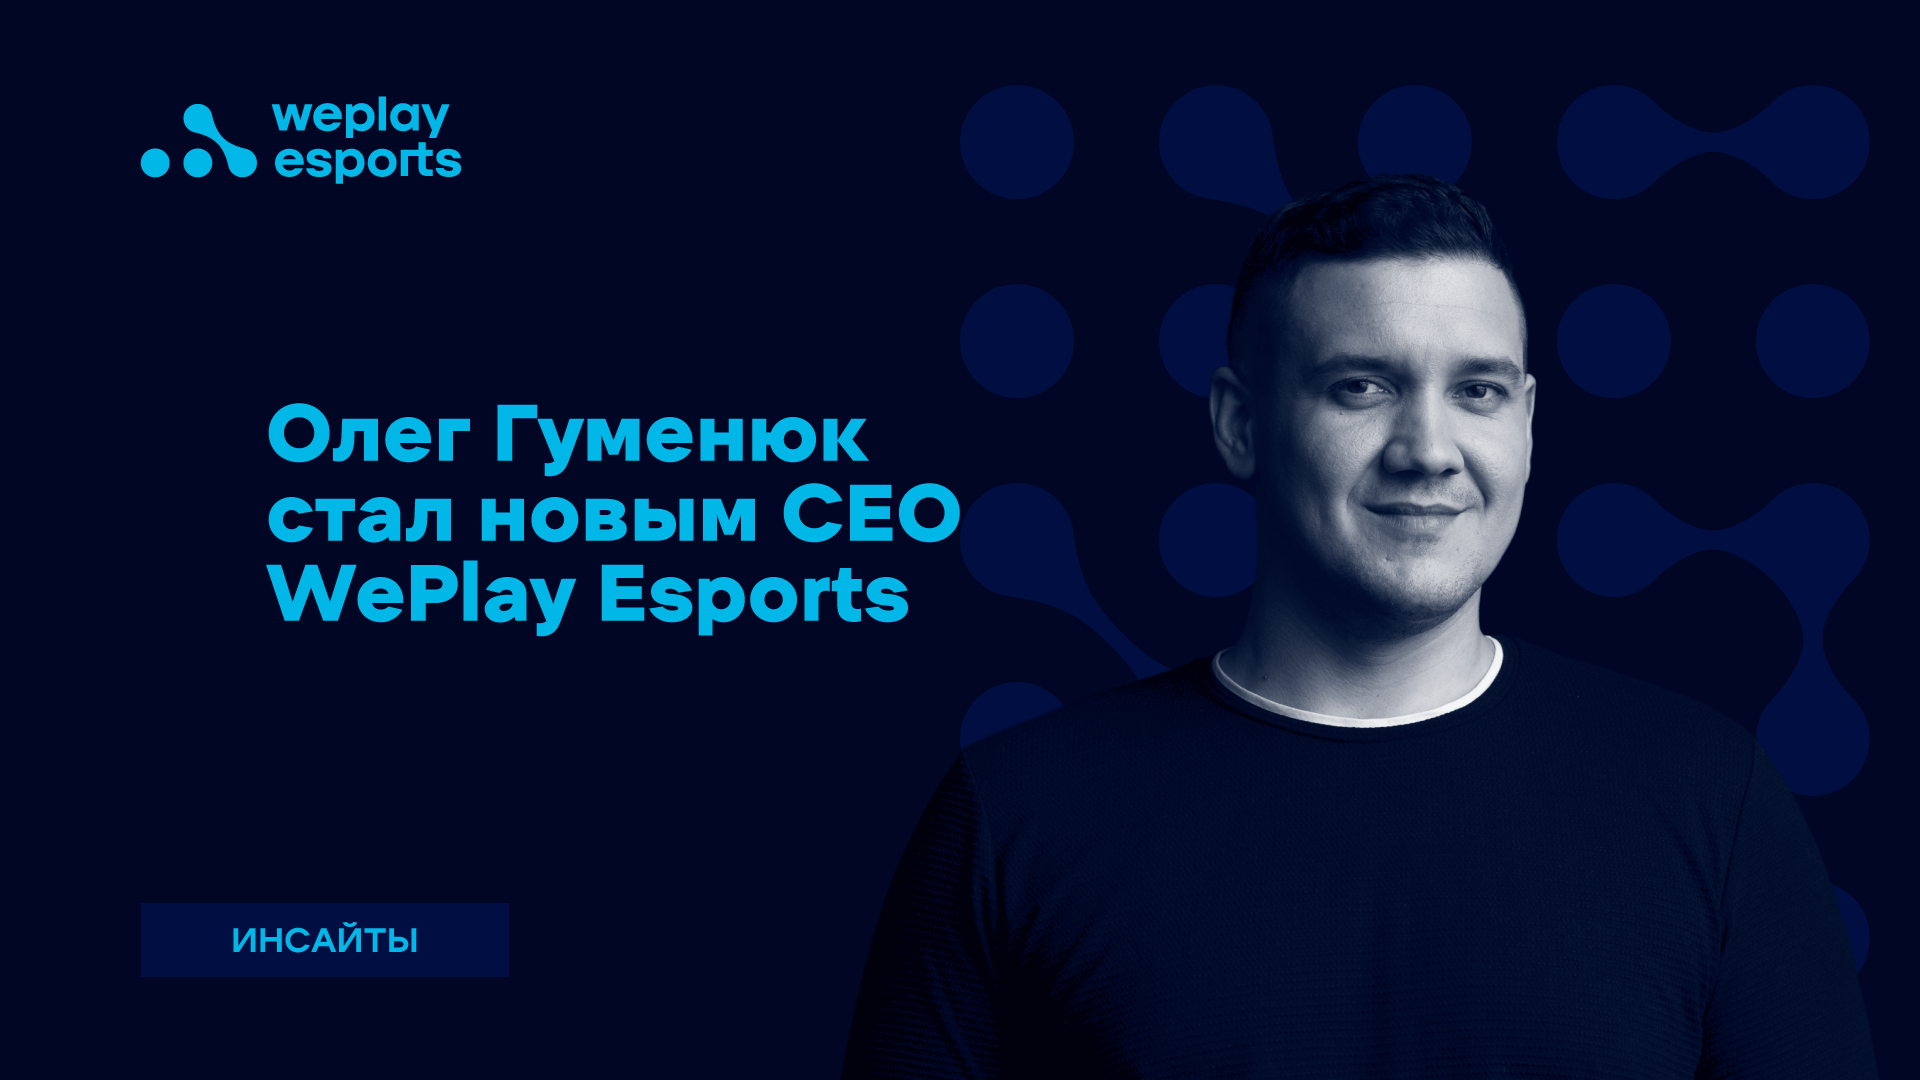 Олег Гуменюк стал новым CEO WePlay Esports